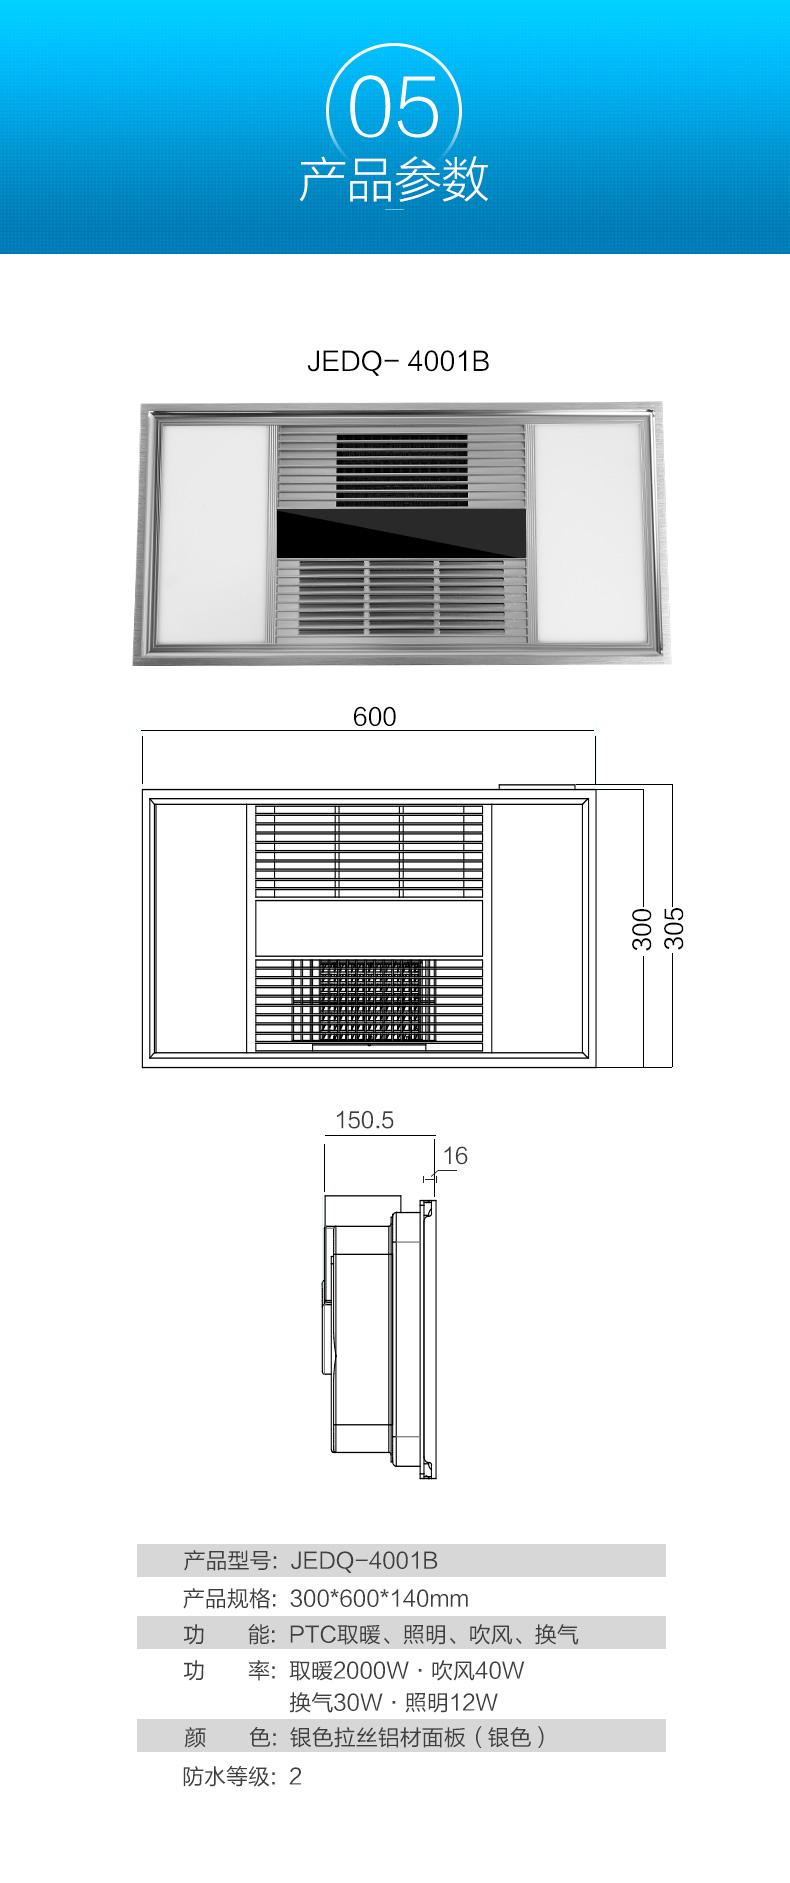 JEDQ-4001B-5002C-8001A_13.jpg